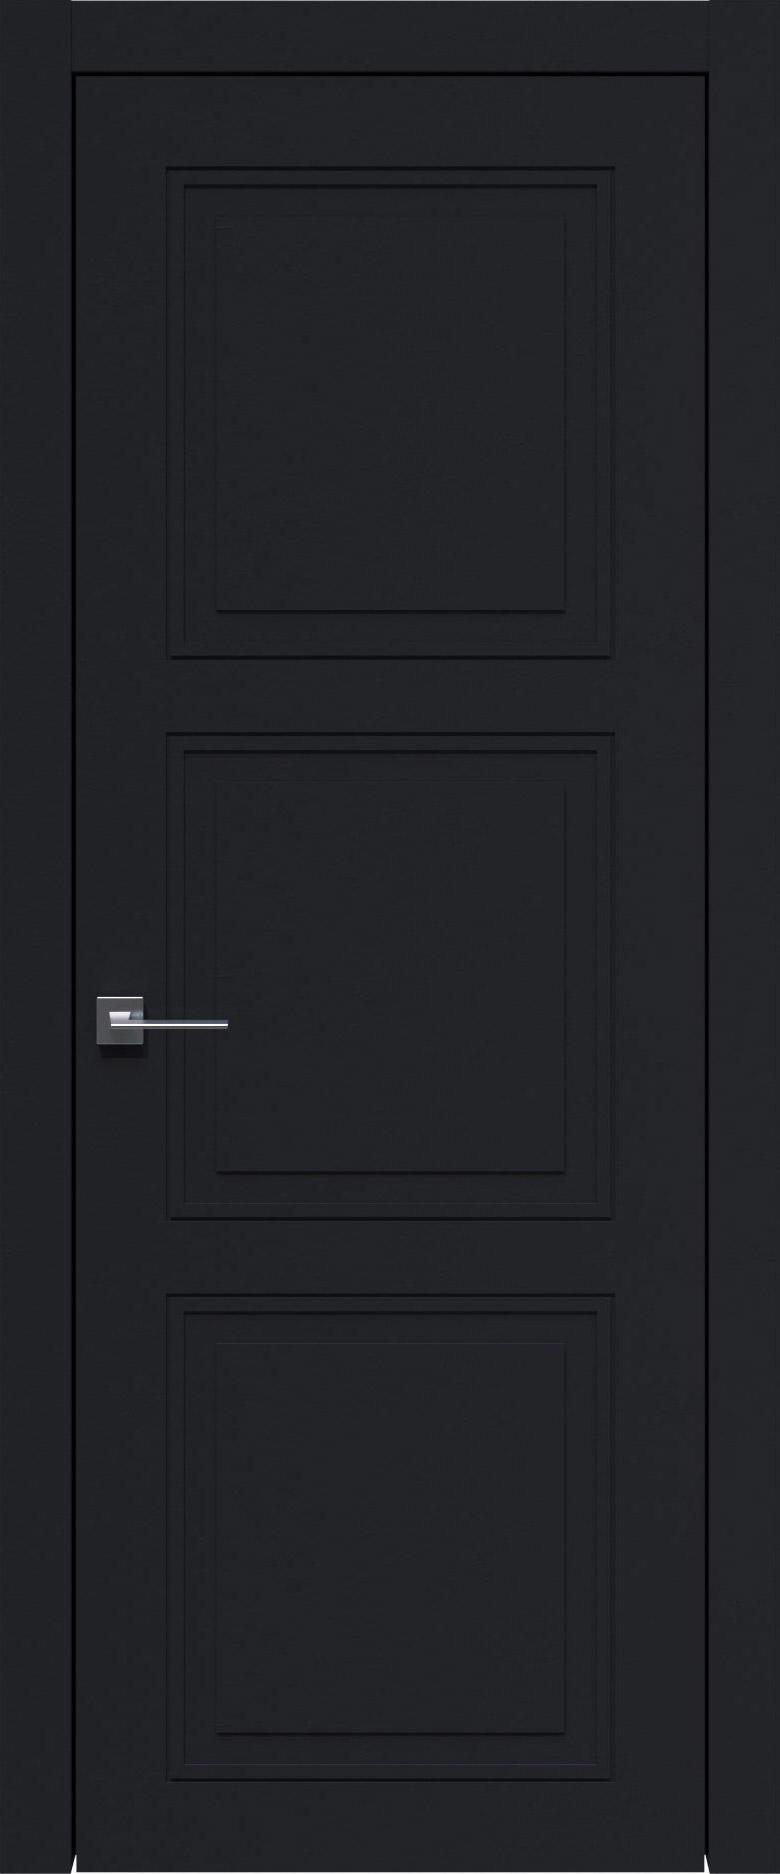 Milano Neo Classic цвет - Черная эмаль (RAL 9004) Без стекла (ДГ)